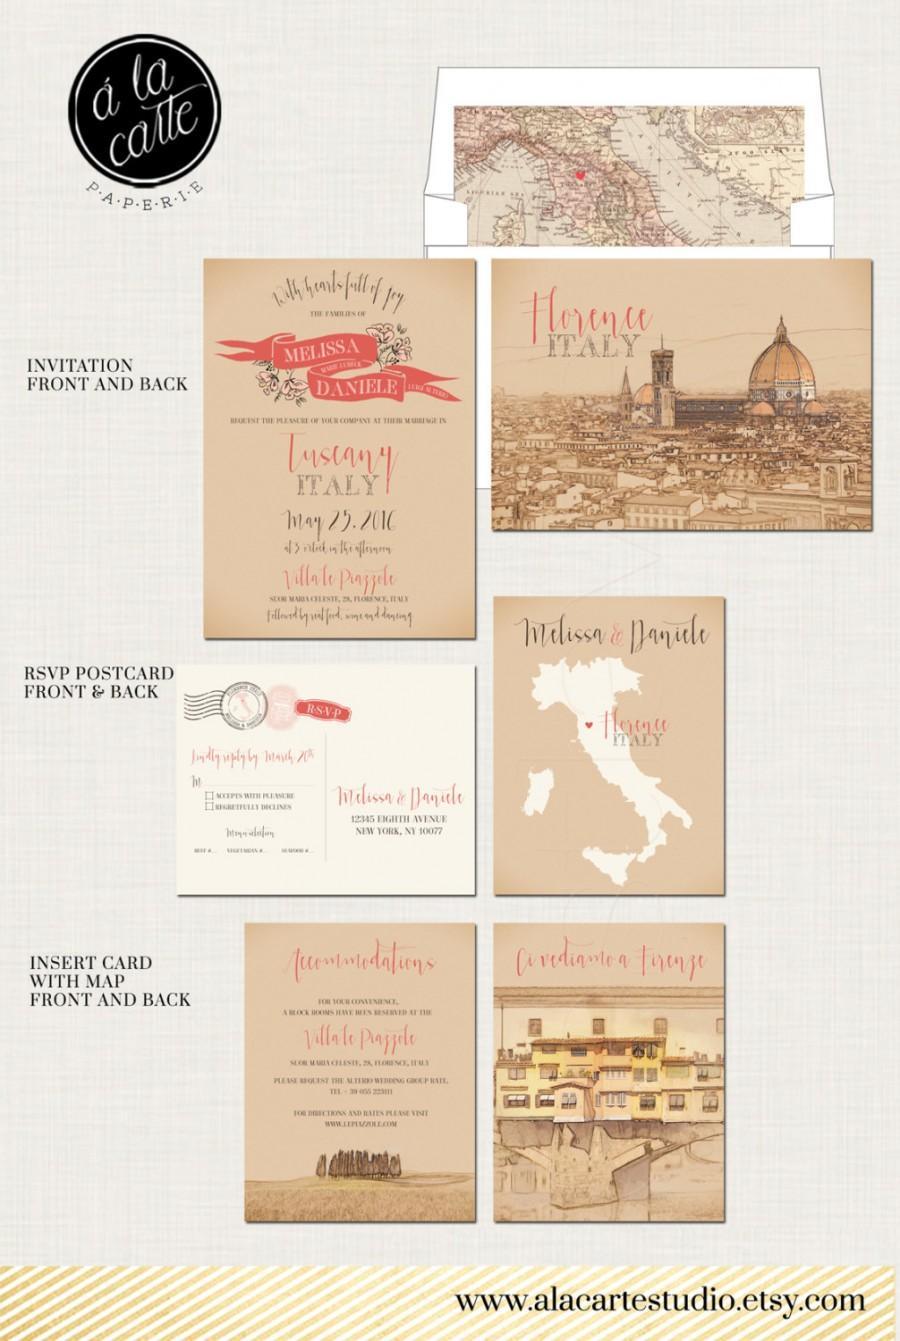 Destination Wedding Invitation Tuscany Florence Italy Suite European Bilingual Ilrated Deposit Payment